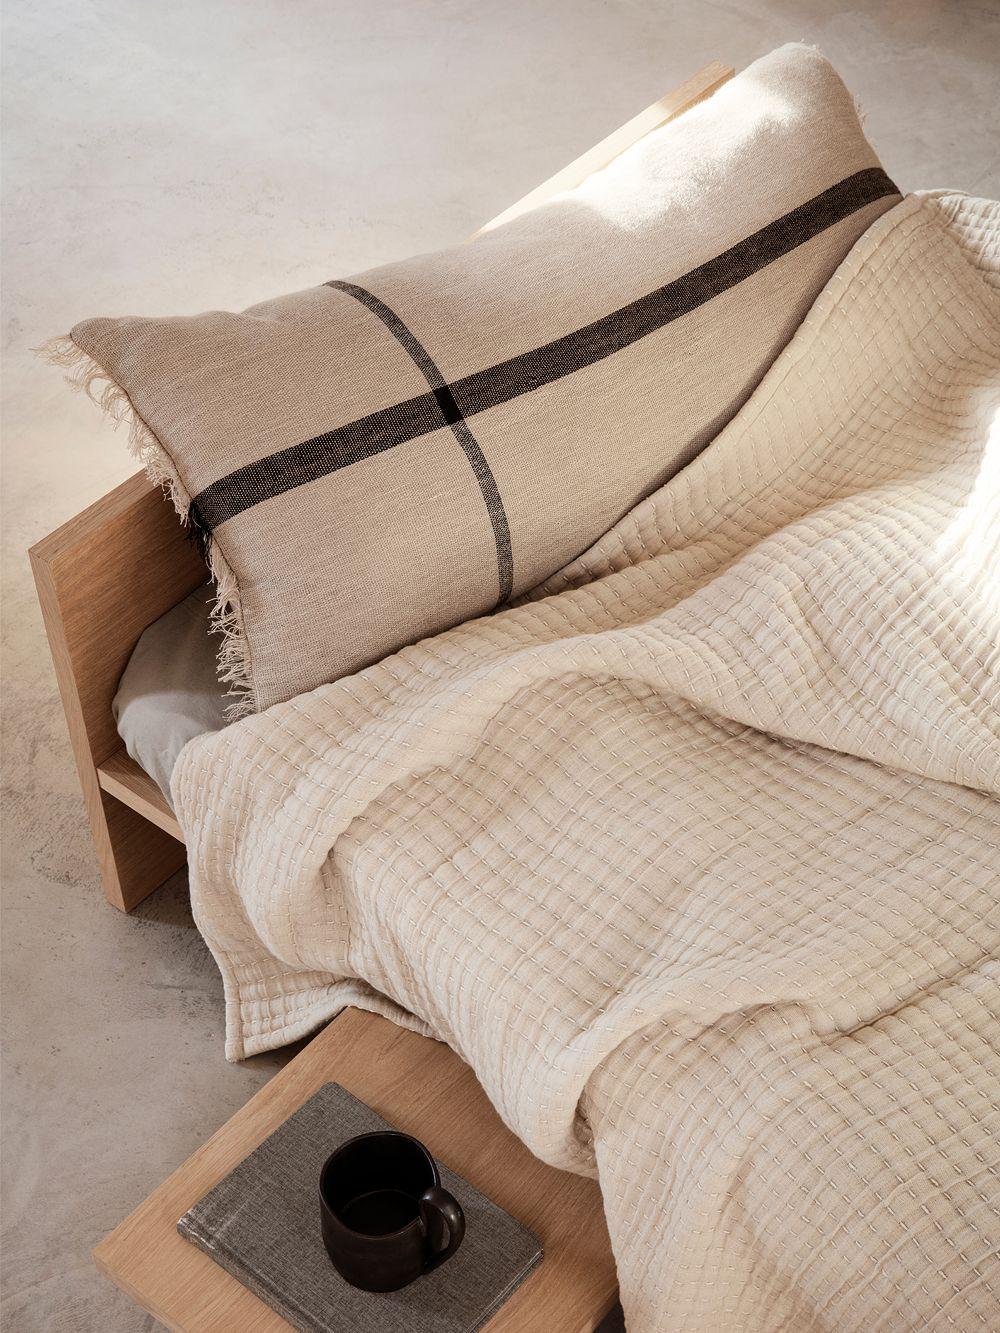 Ferm Living's Calm cushion is bedroom decor.